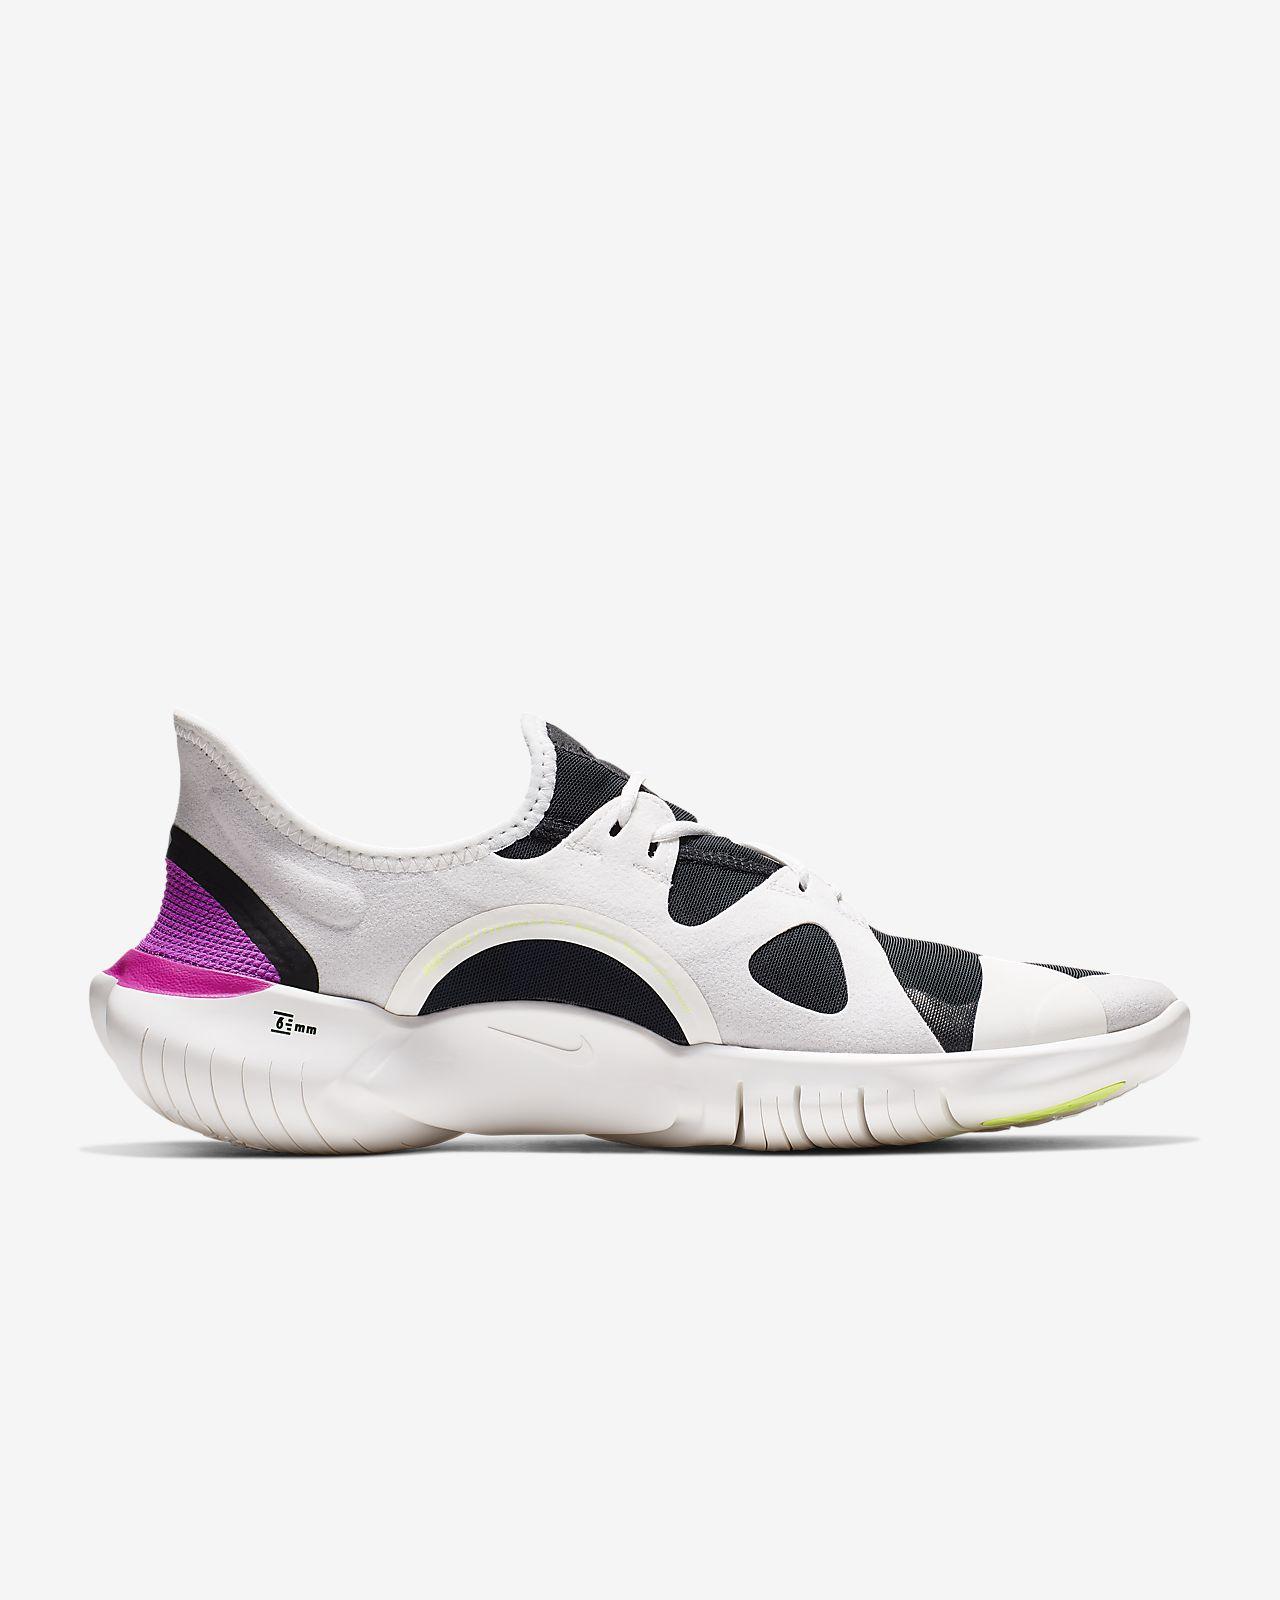 ab823d6341d9 Nike Free RN 5.0 Men s Running Shoe. Nike.com AU